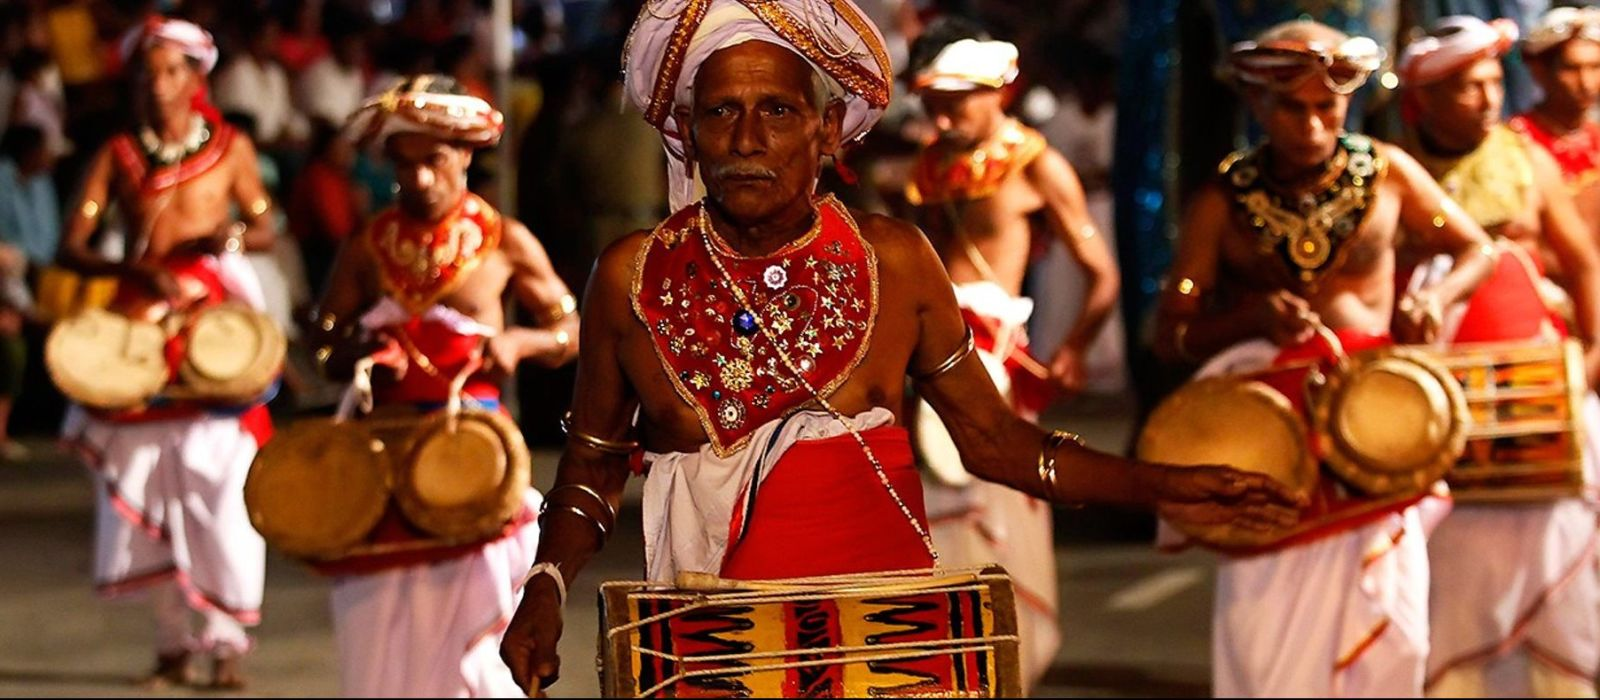 Highlights of Sri Lanka - Experience the festival of Perahera at Kandy in Sri Lanka with Enchanting Travels